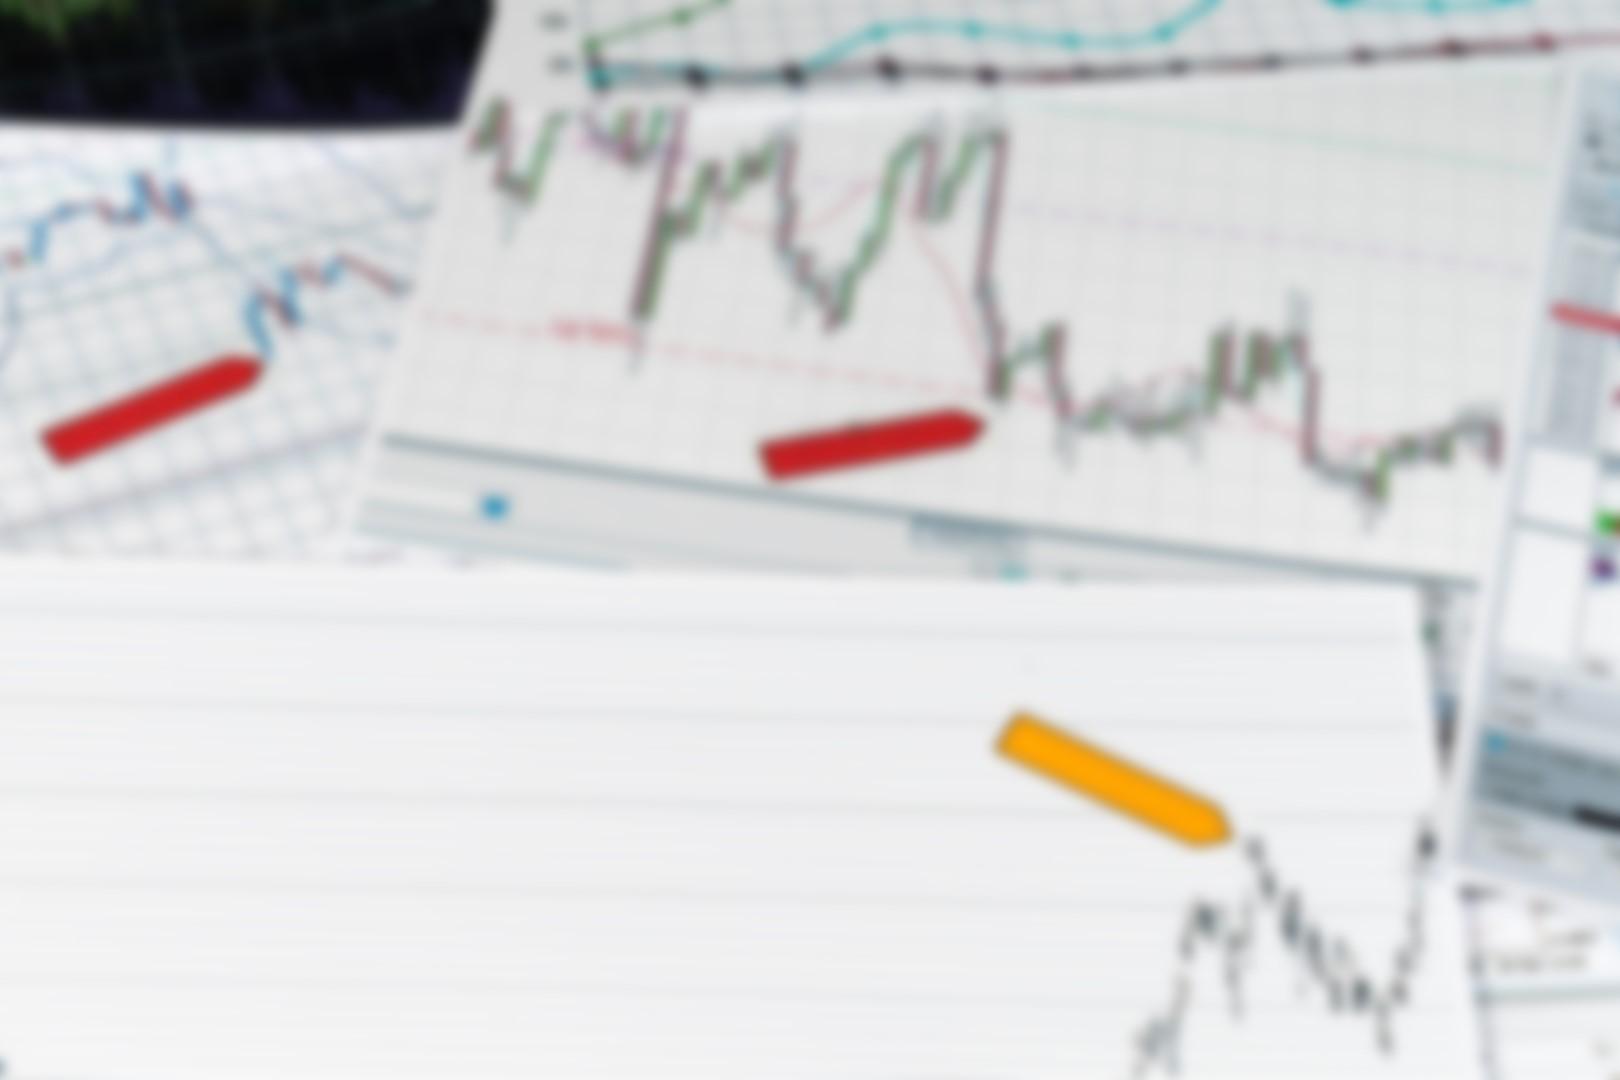 METLIFE ANNOUNCES FINANCE ORGANIZATIONAL CHANGES